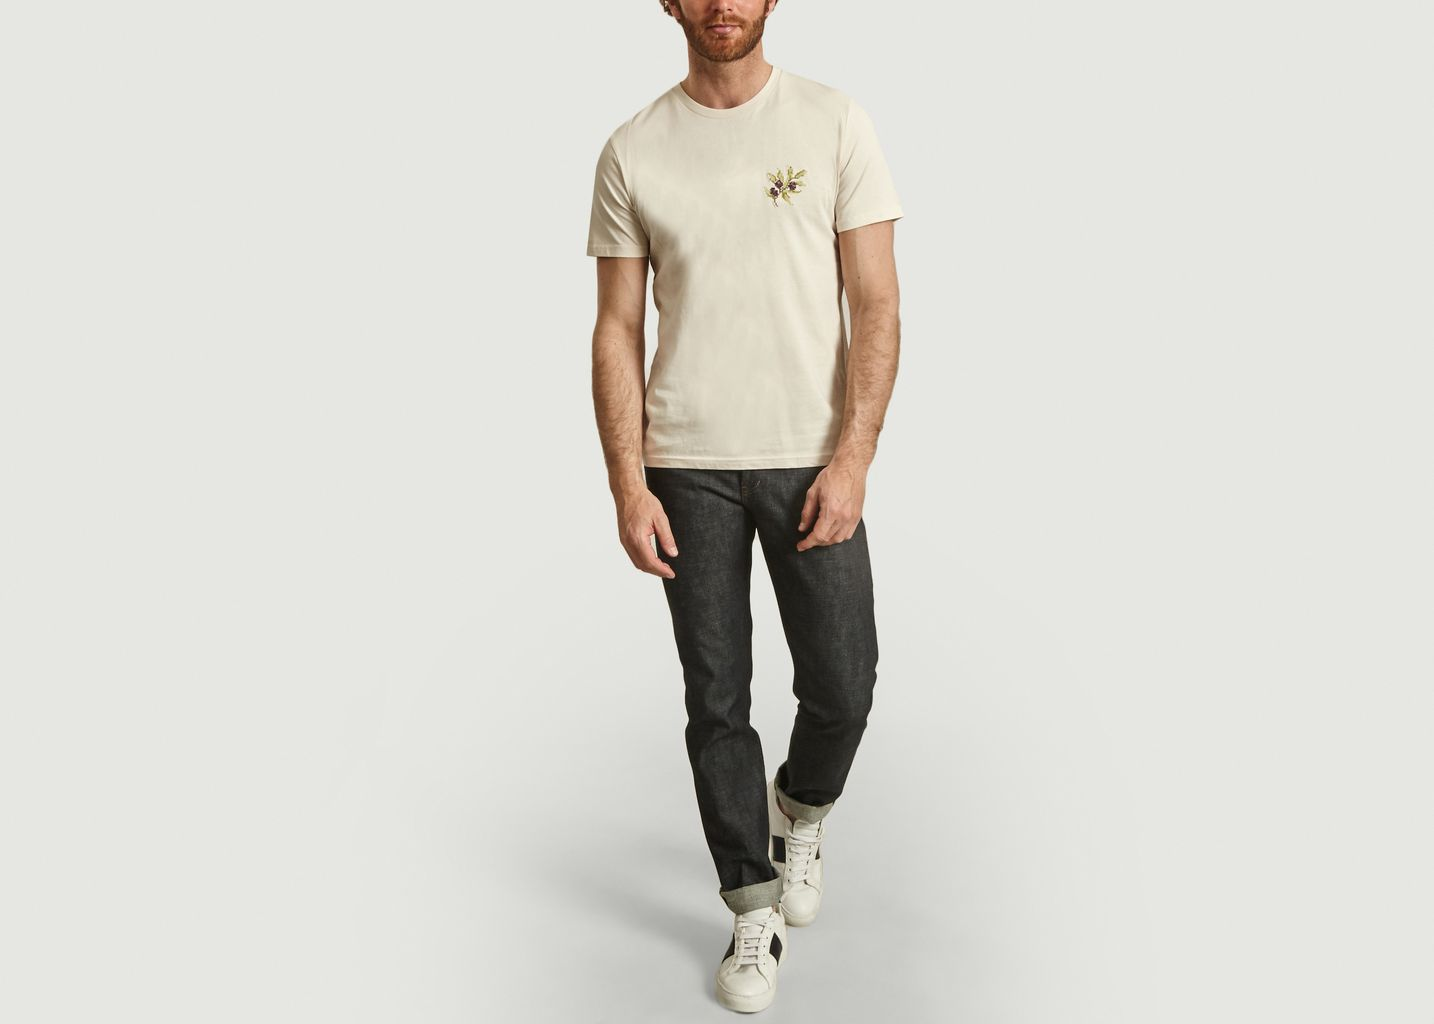 T-shirt Olives à broderie - Johnny Romance